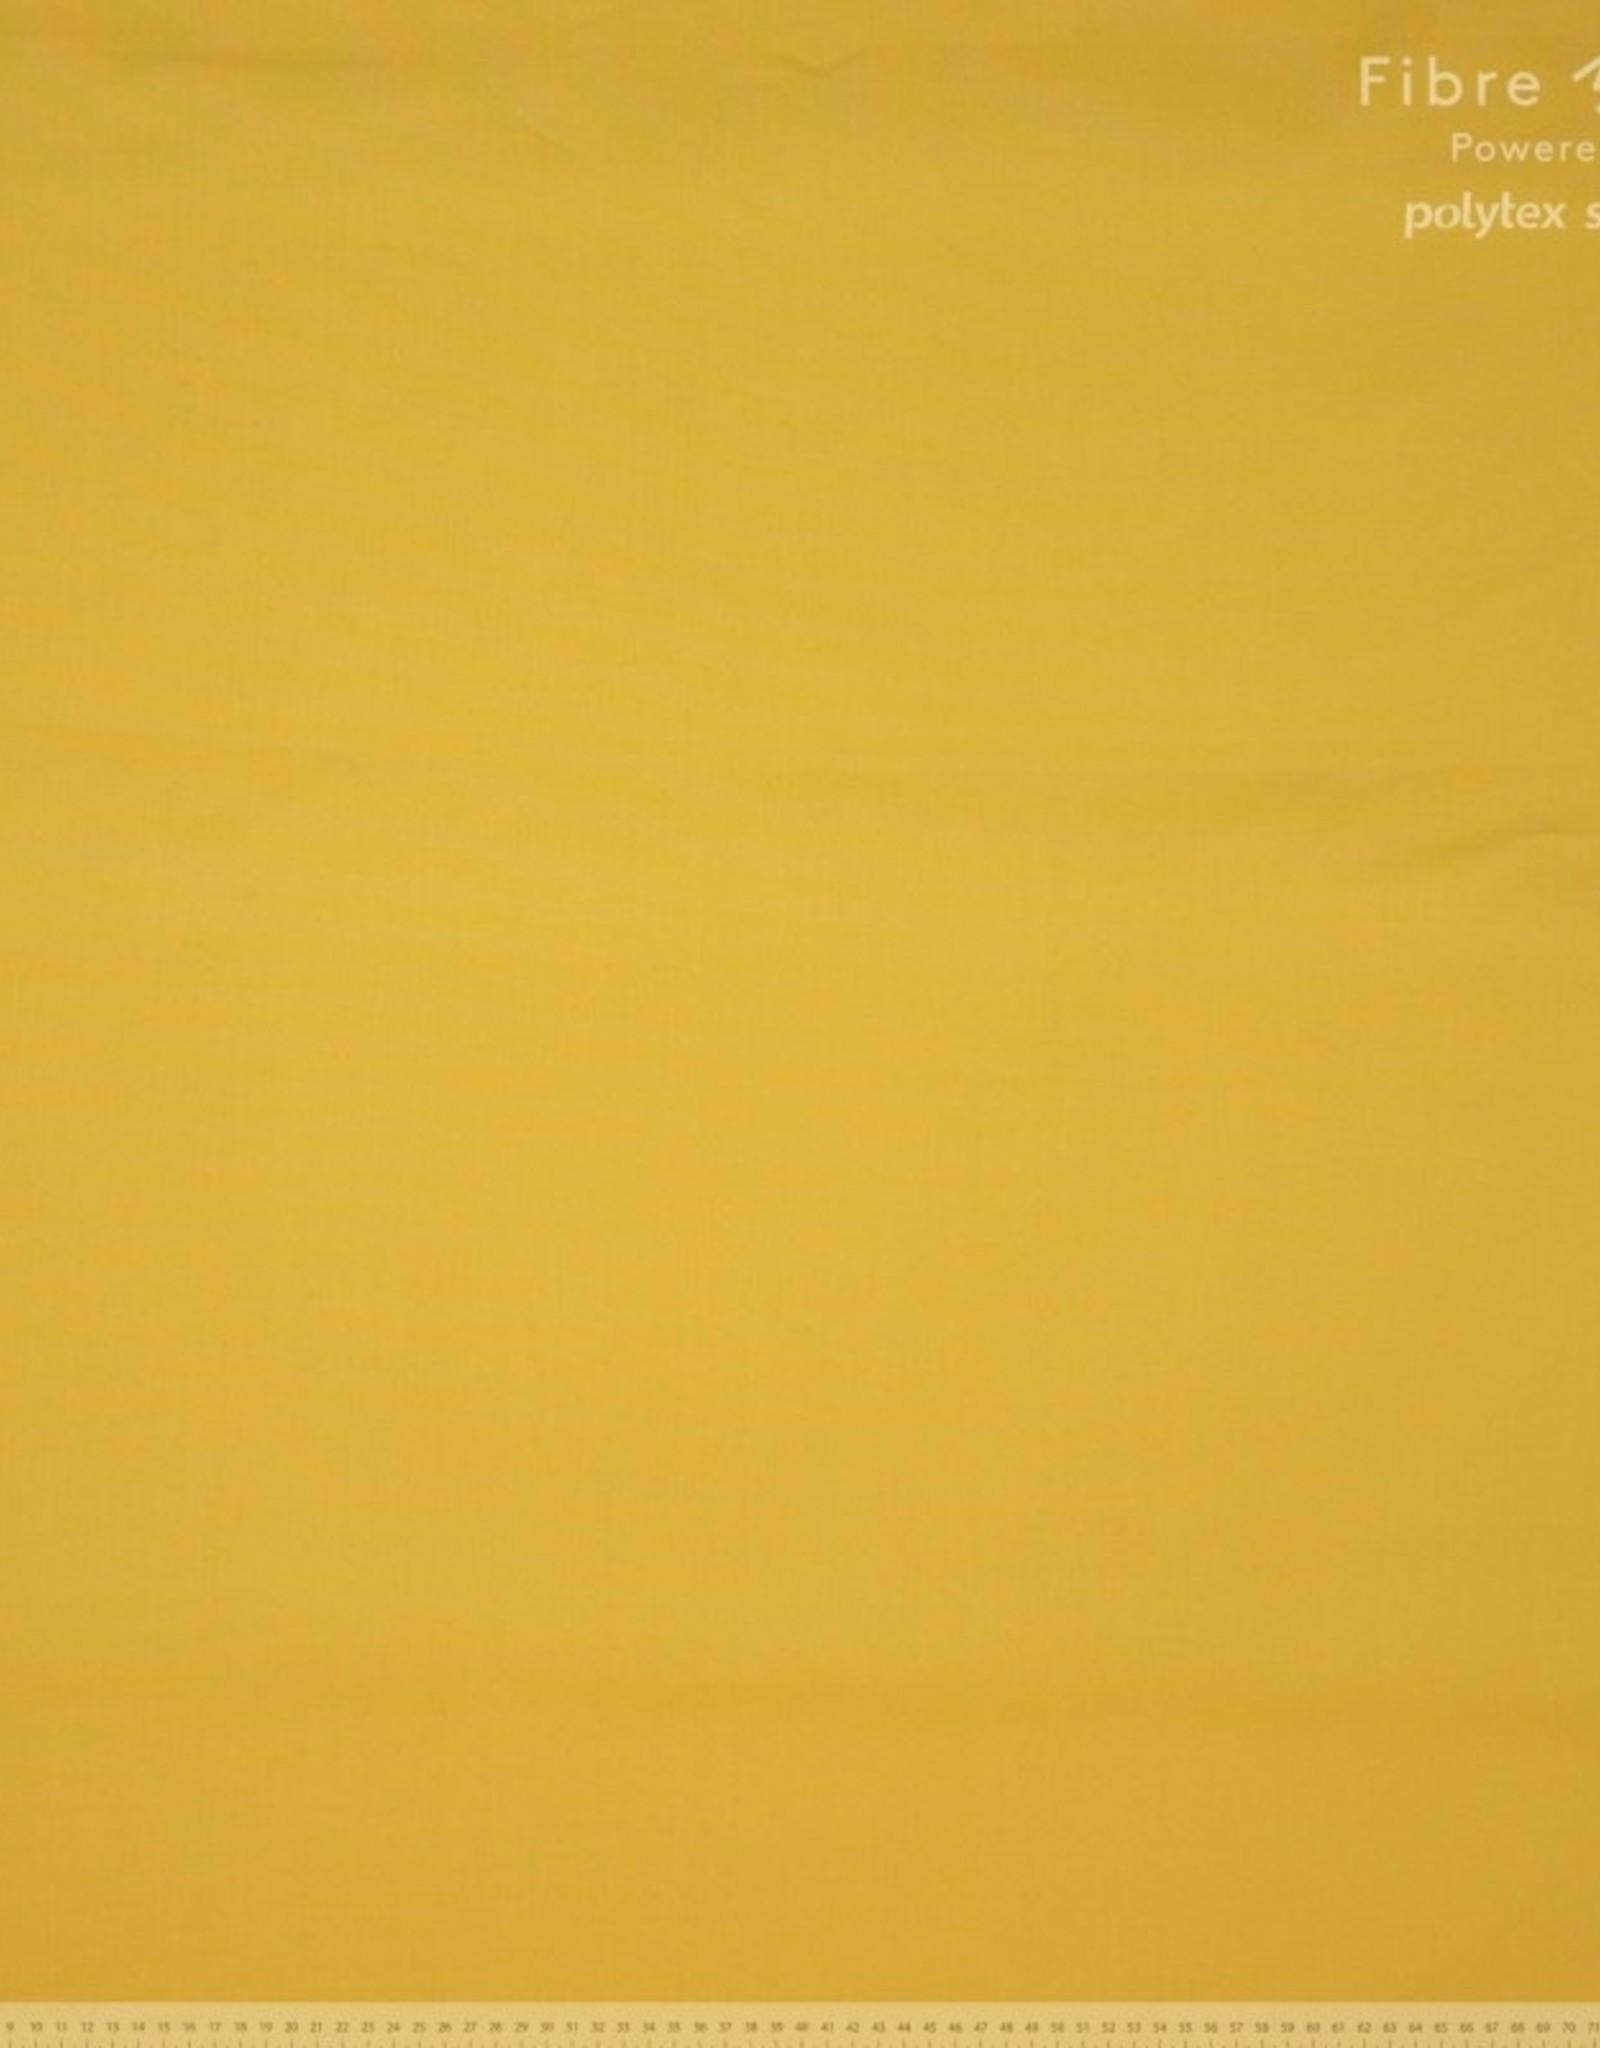 Fibre Mood katoen poplin stretch yellow FM Mae, Chloe